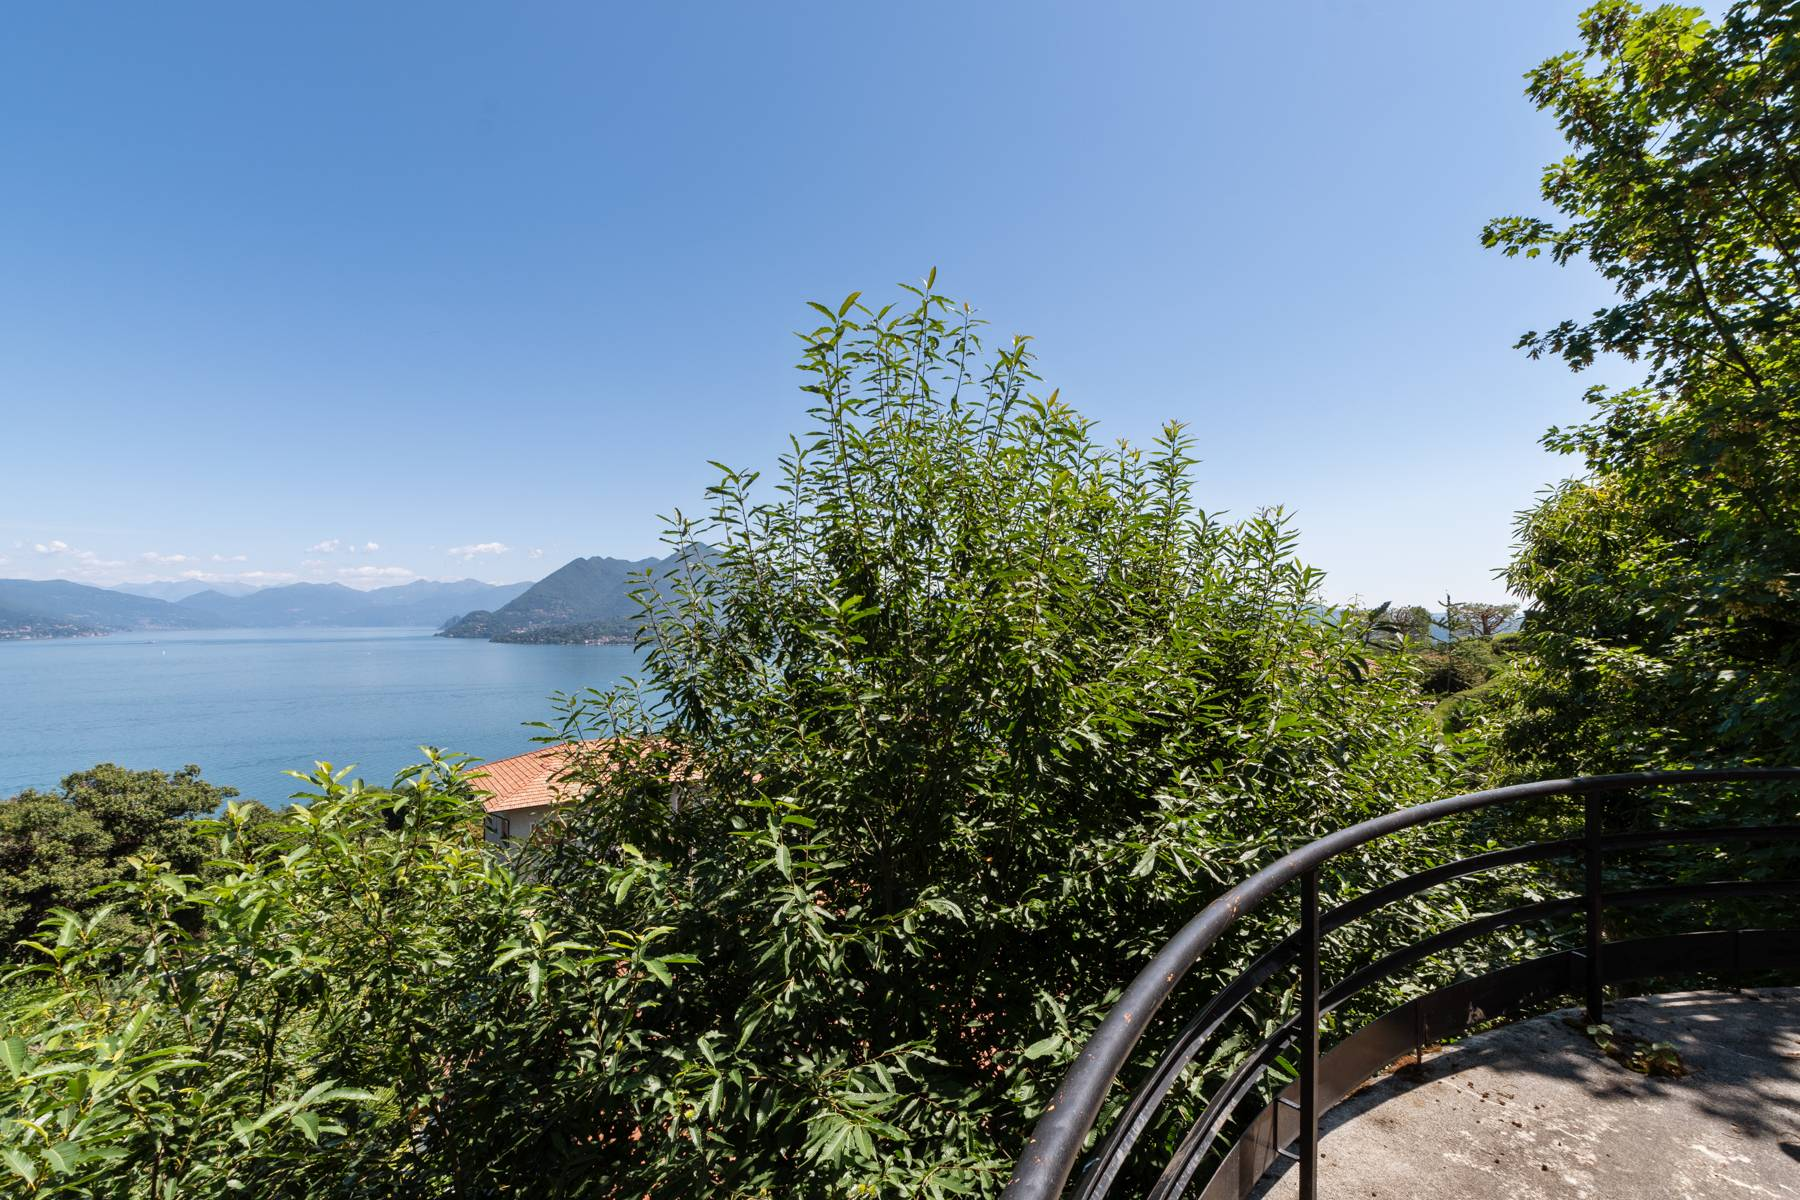 Villa in Vendita a Stresa: 5 locali, 150 mq - Foto 3